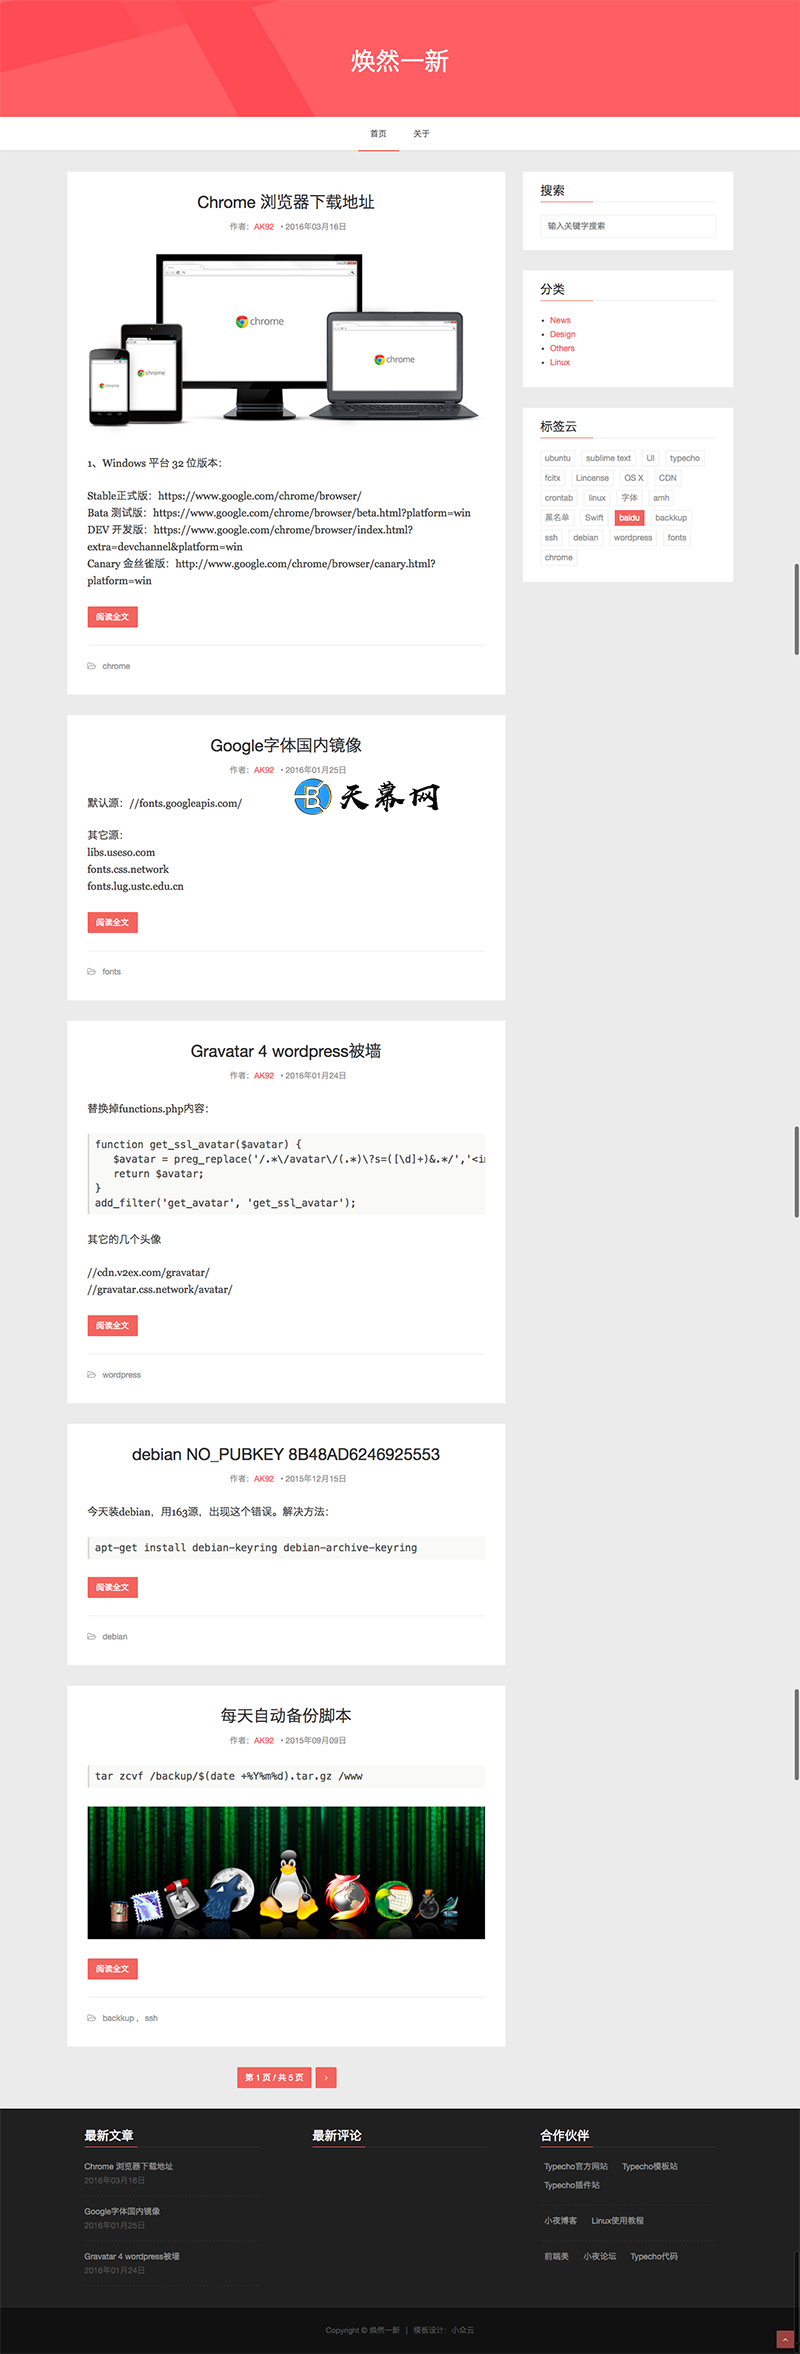 Typecho免费主题SevenTeen 2017新主题 博客模板 第1张